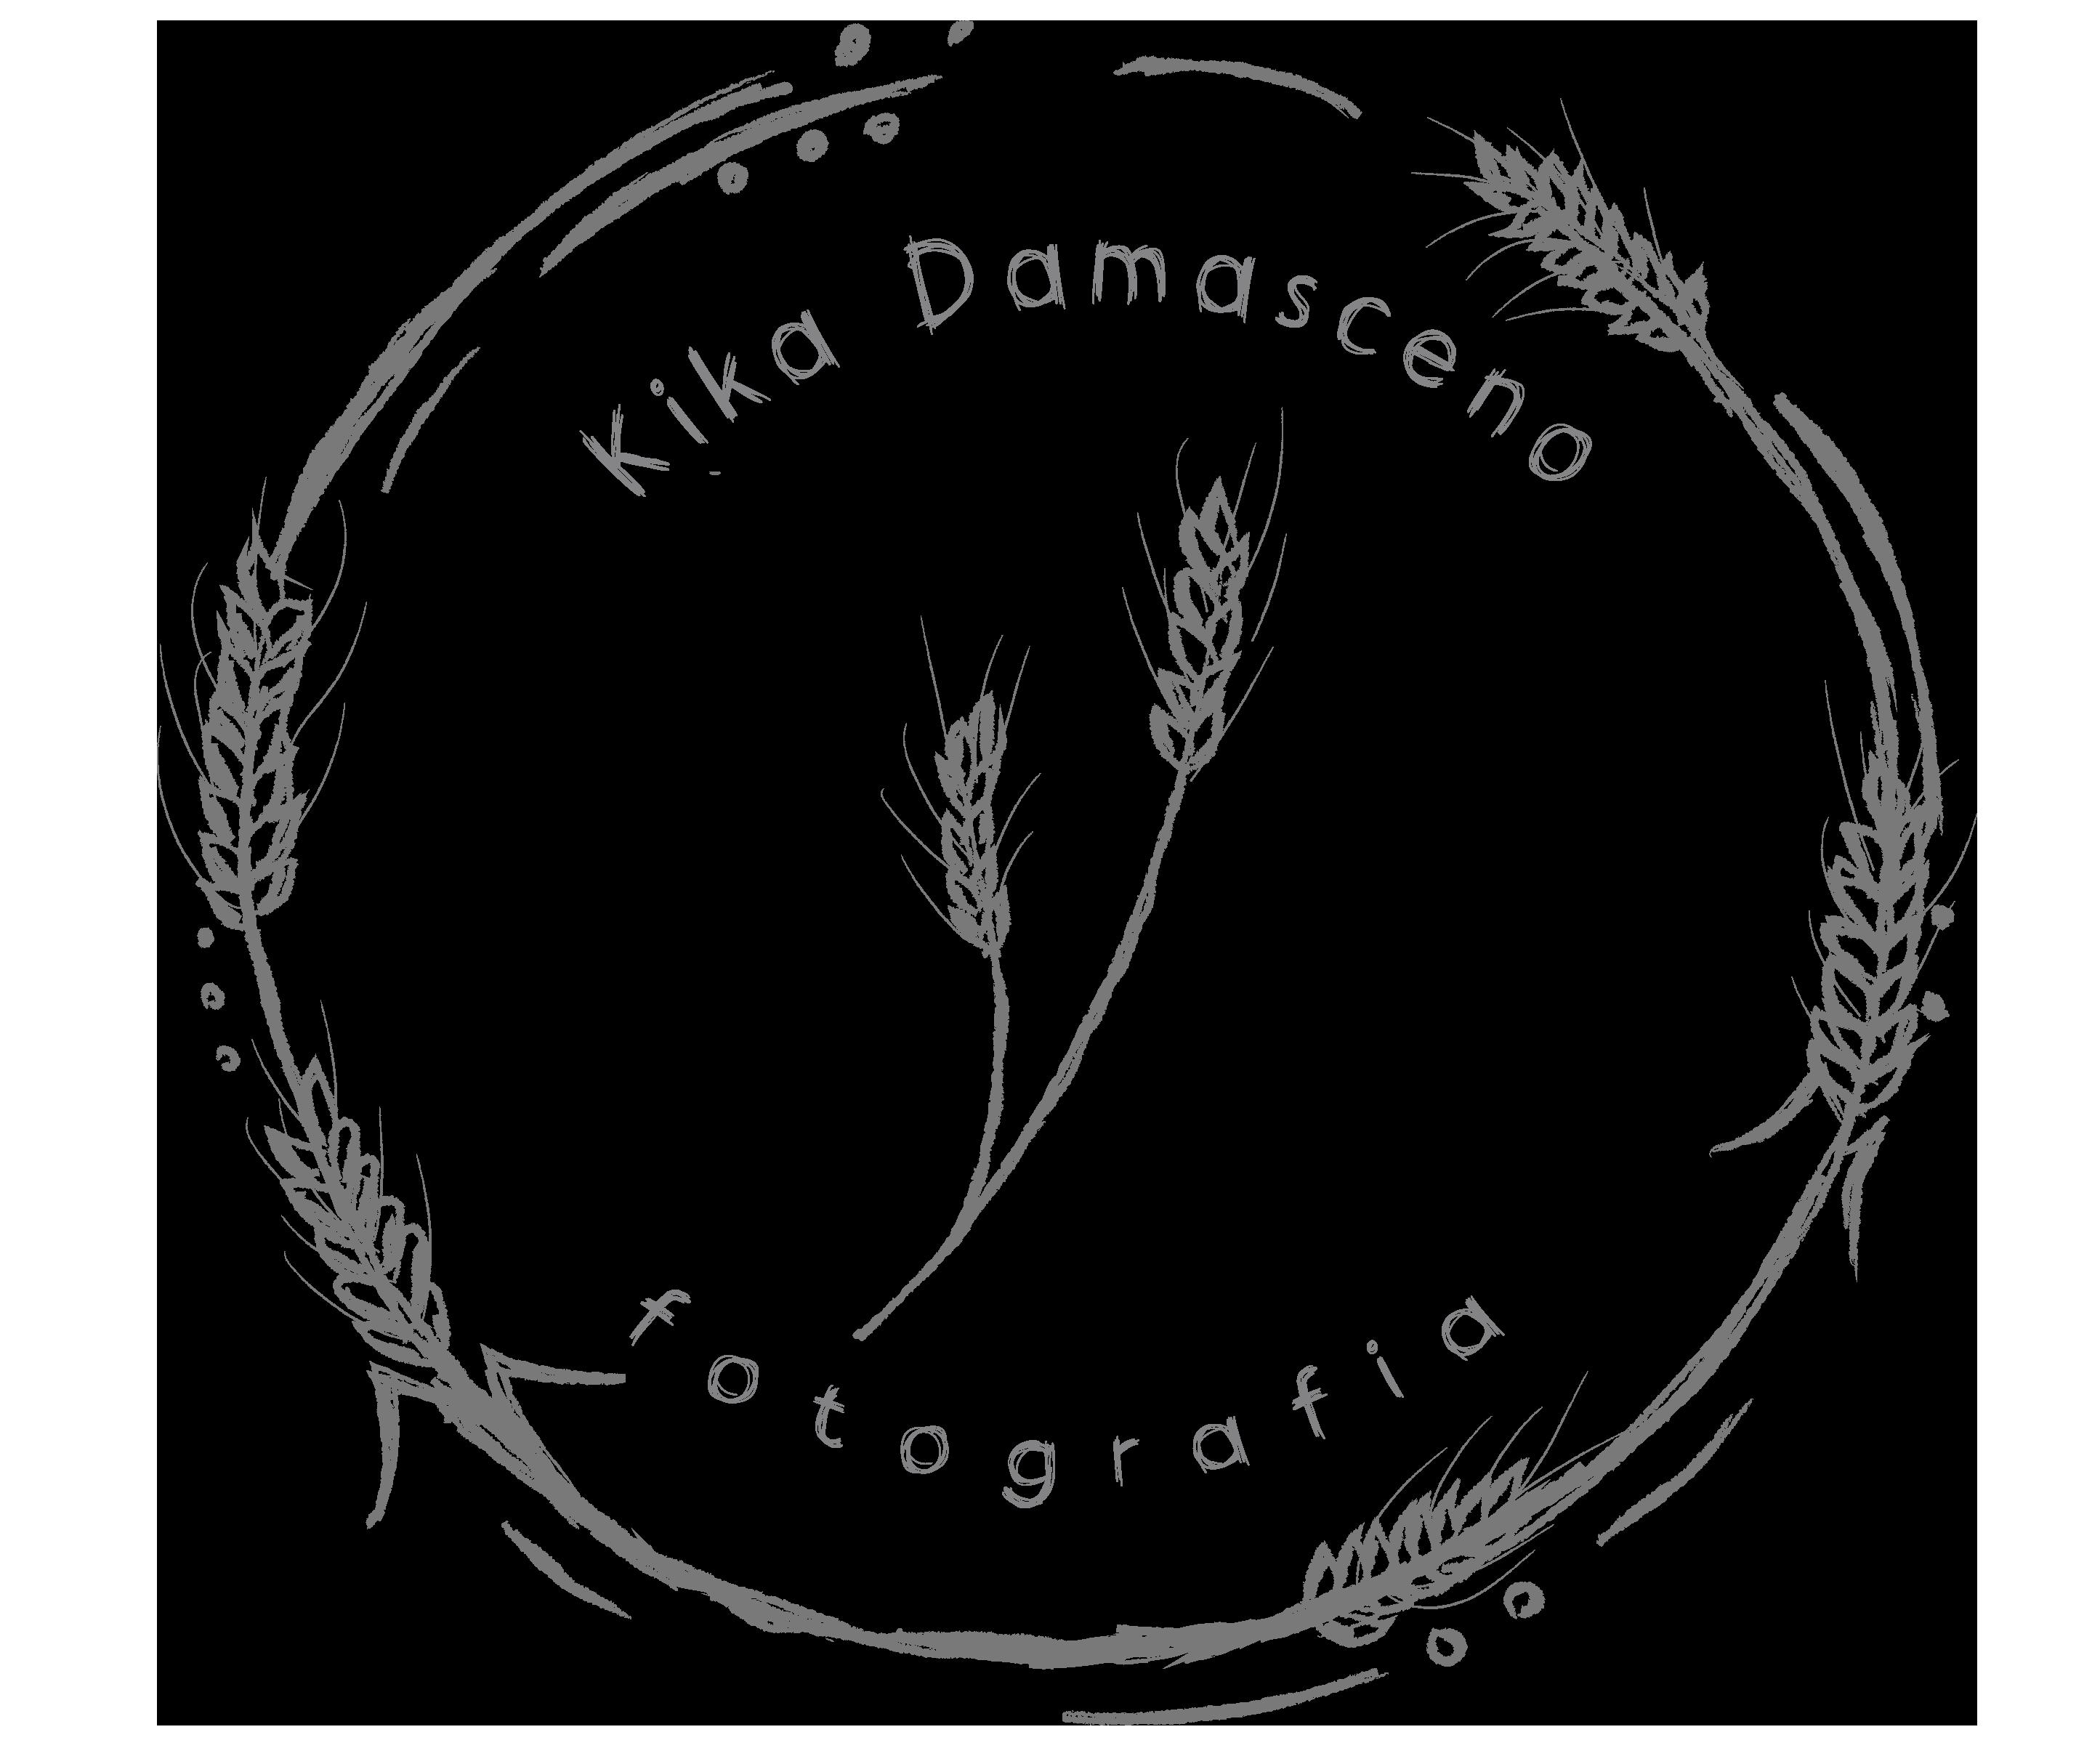 Contate Kika Damasceno Fotografia